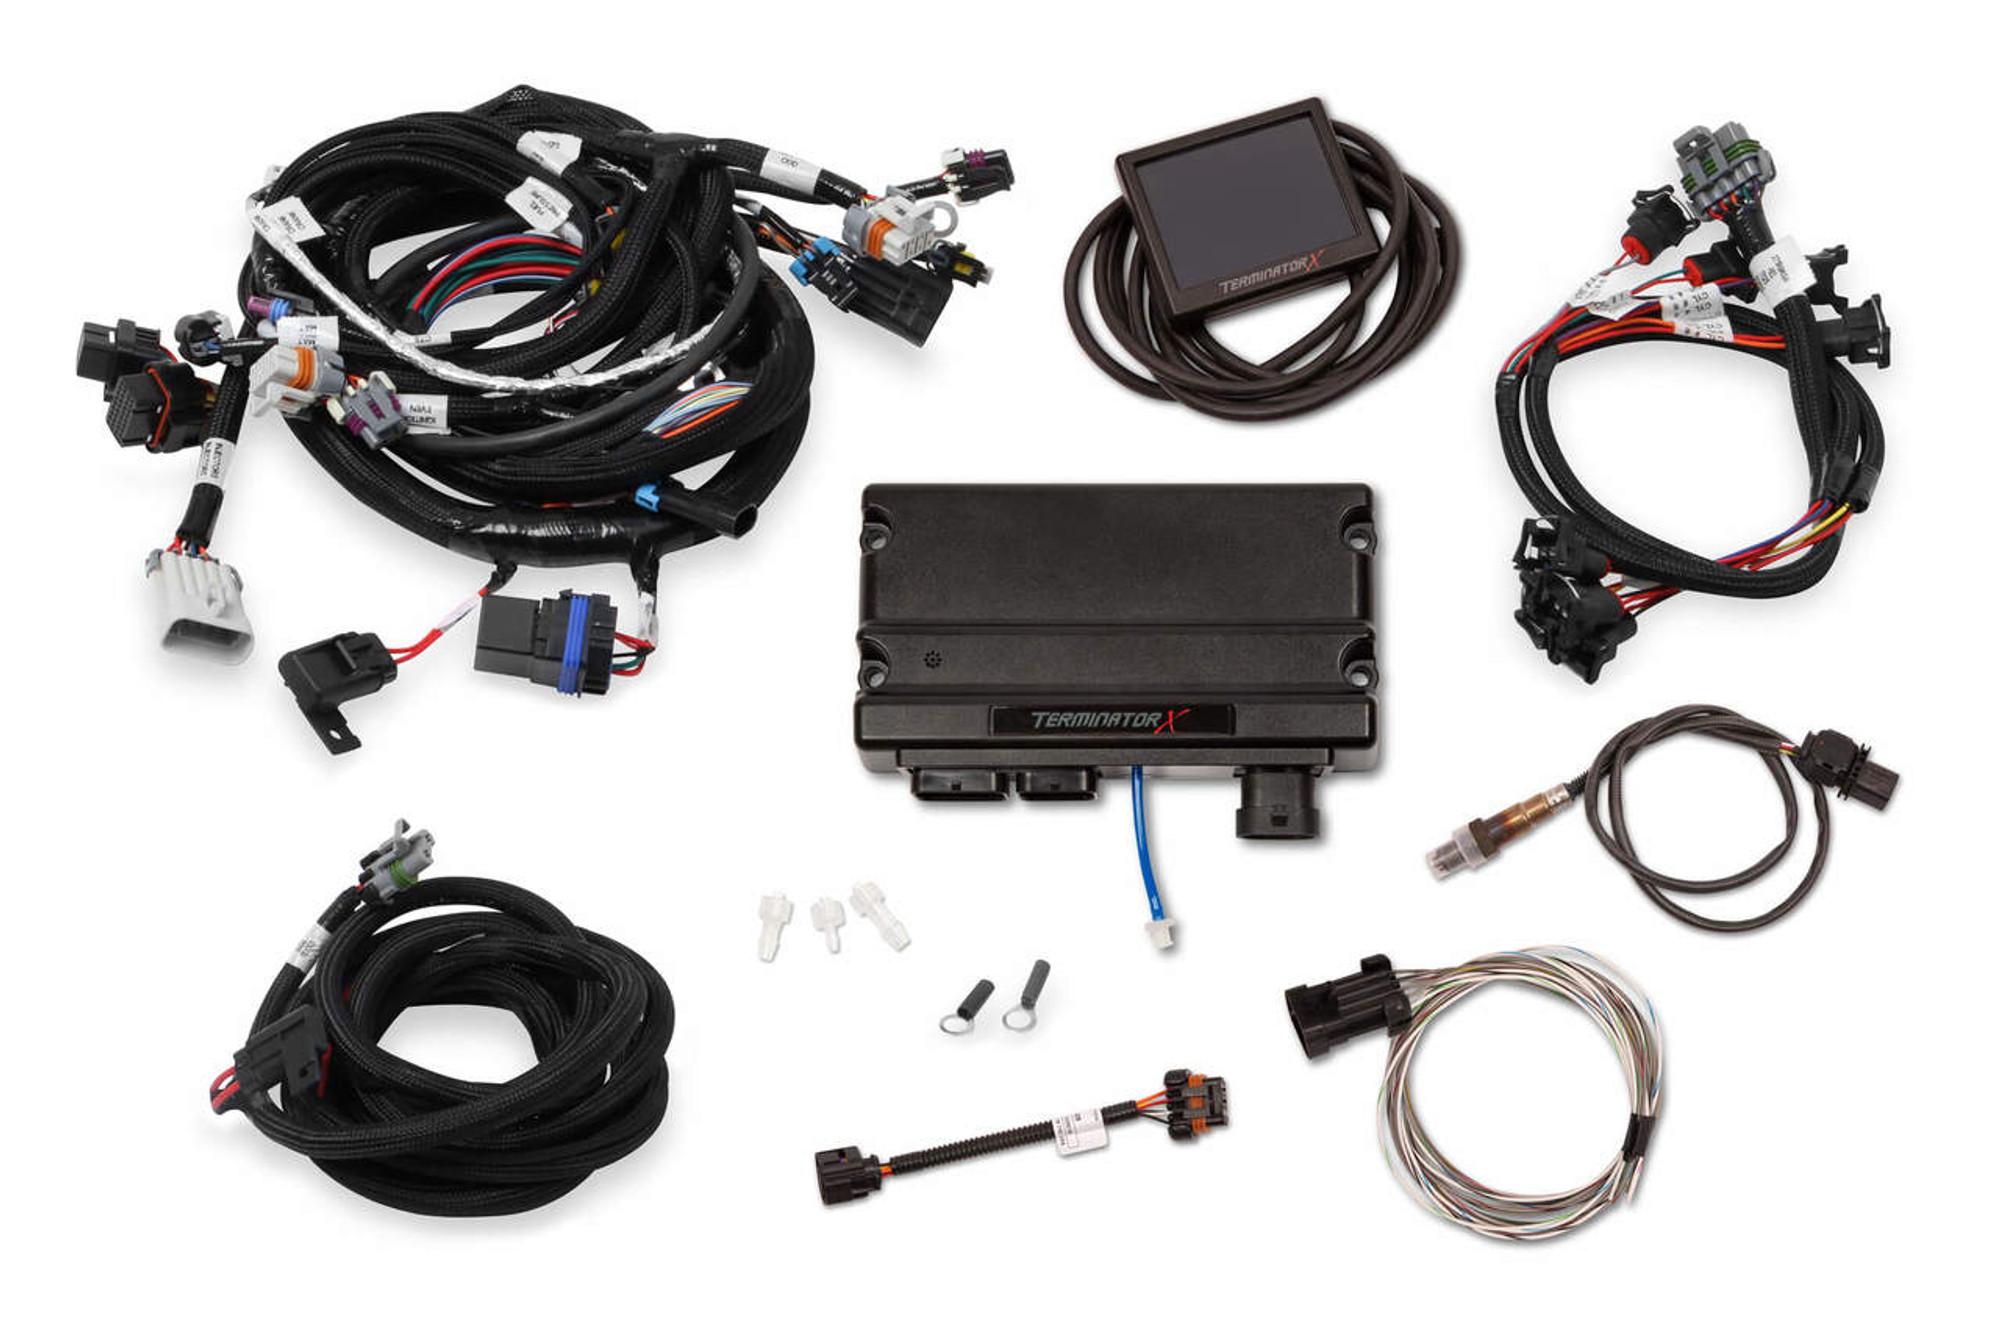 medium resolution of holley efi terminator x ls1 24x 1x mpfi kit 550 903